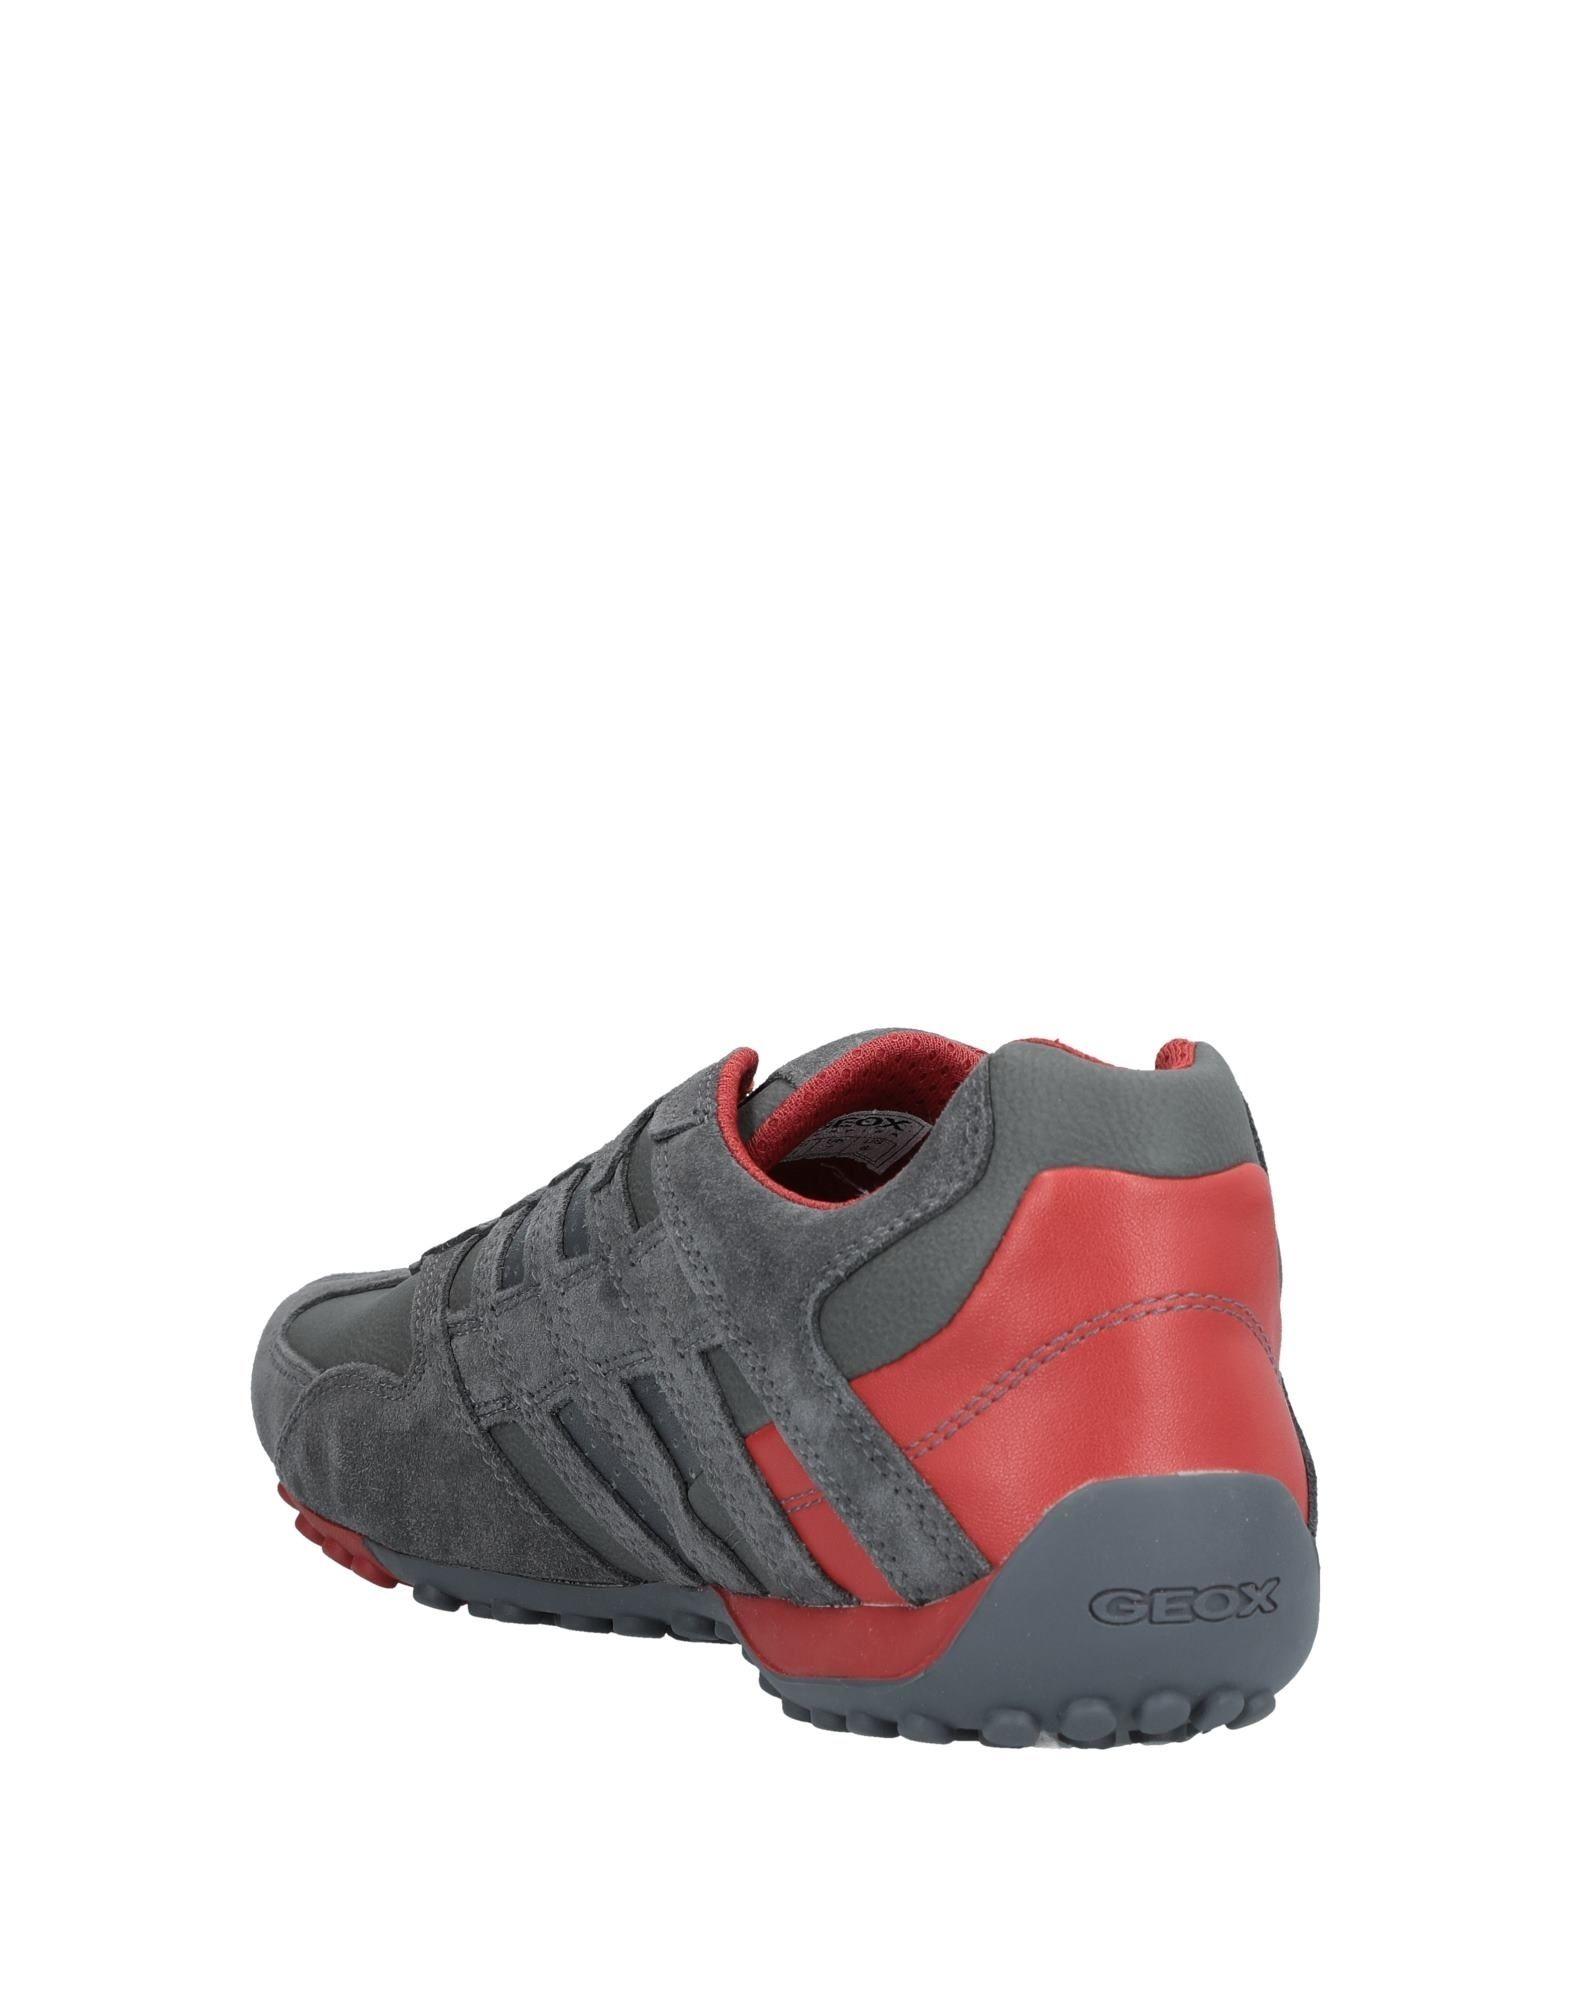 Geox Geox Geox Sneakers Herren Gutes Preis-Leistungs-Verhältnis, es lohnt sich 8094da